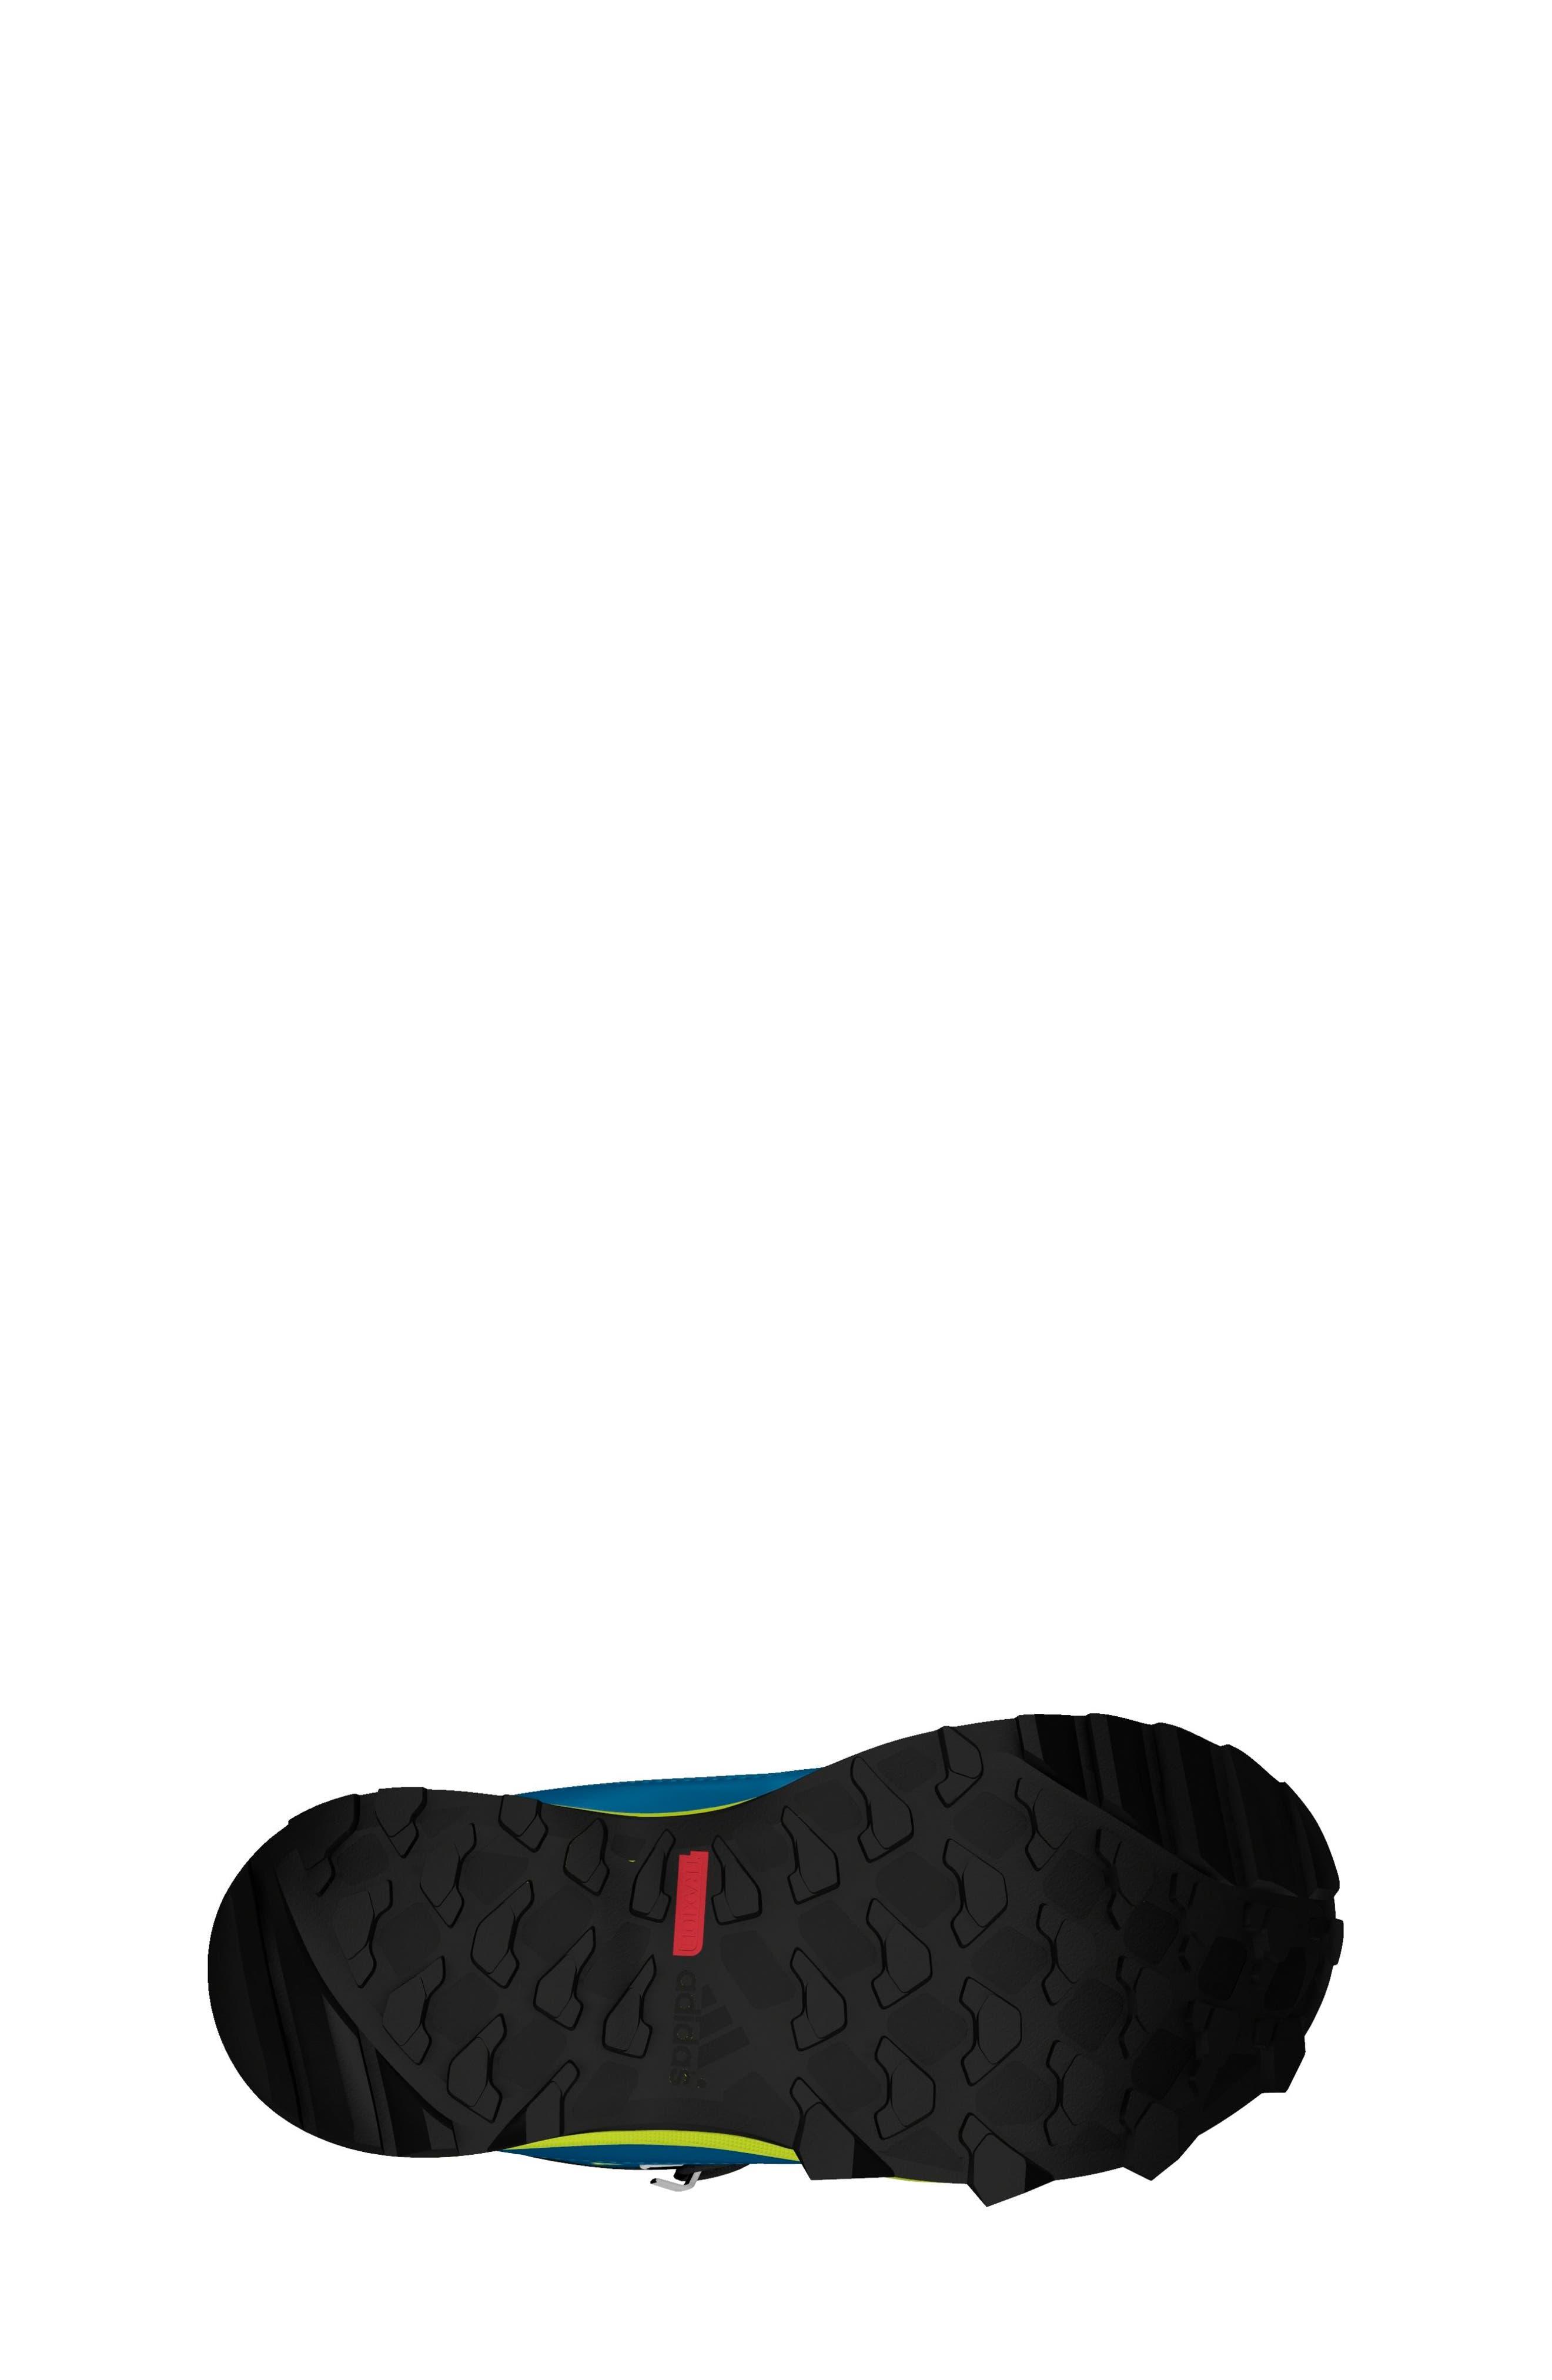 Terrex Snow Sneaker Boot,                             Alternate thumbnail 11, color,